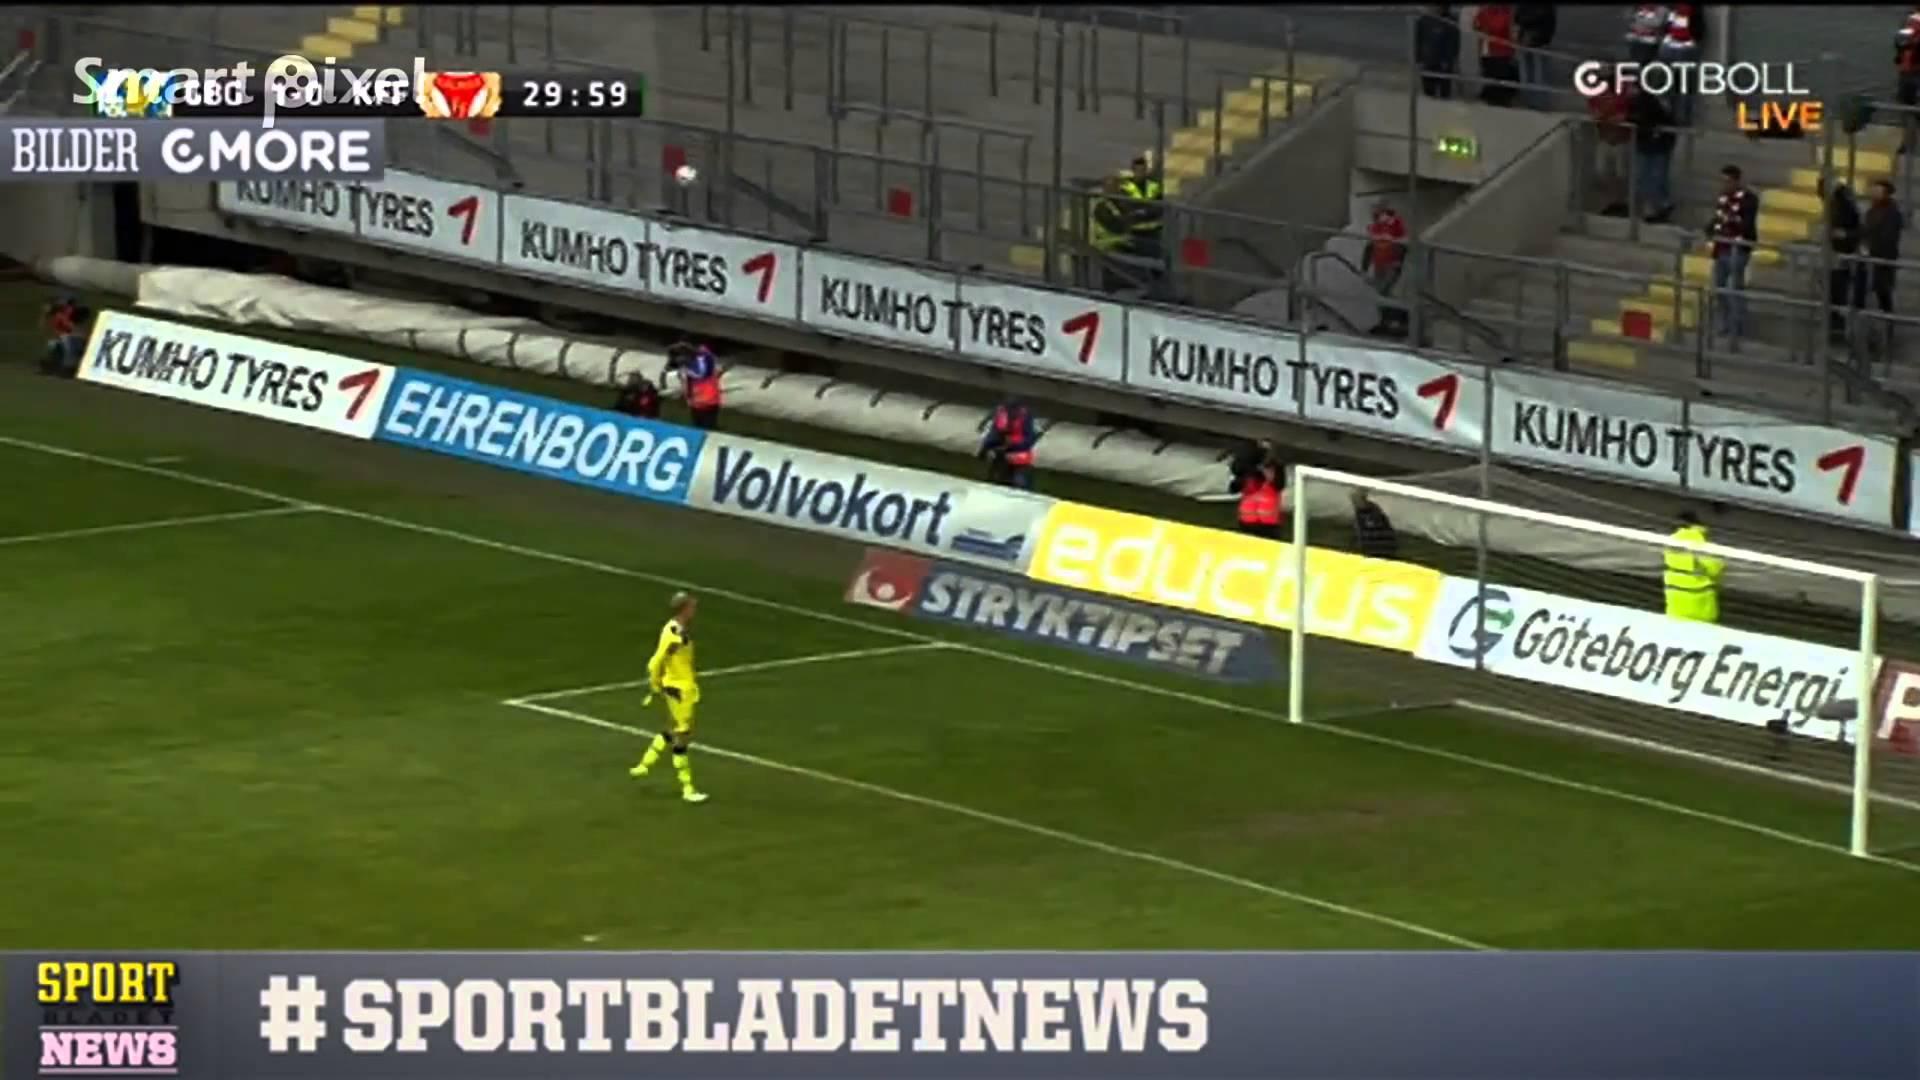 Video: IFK Göteborg – Kalmar FF (2-0), Allsvenskan